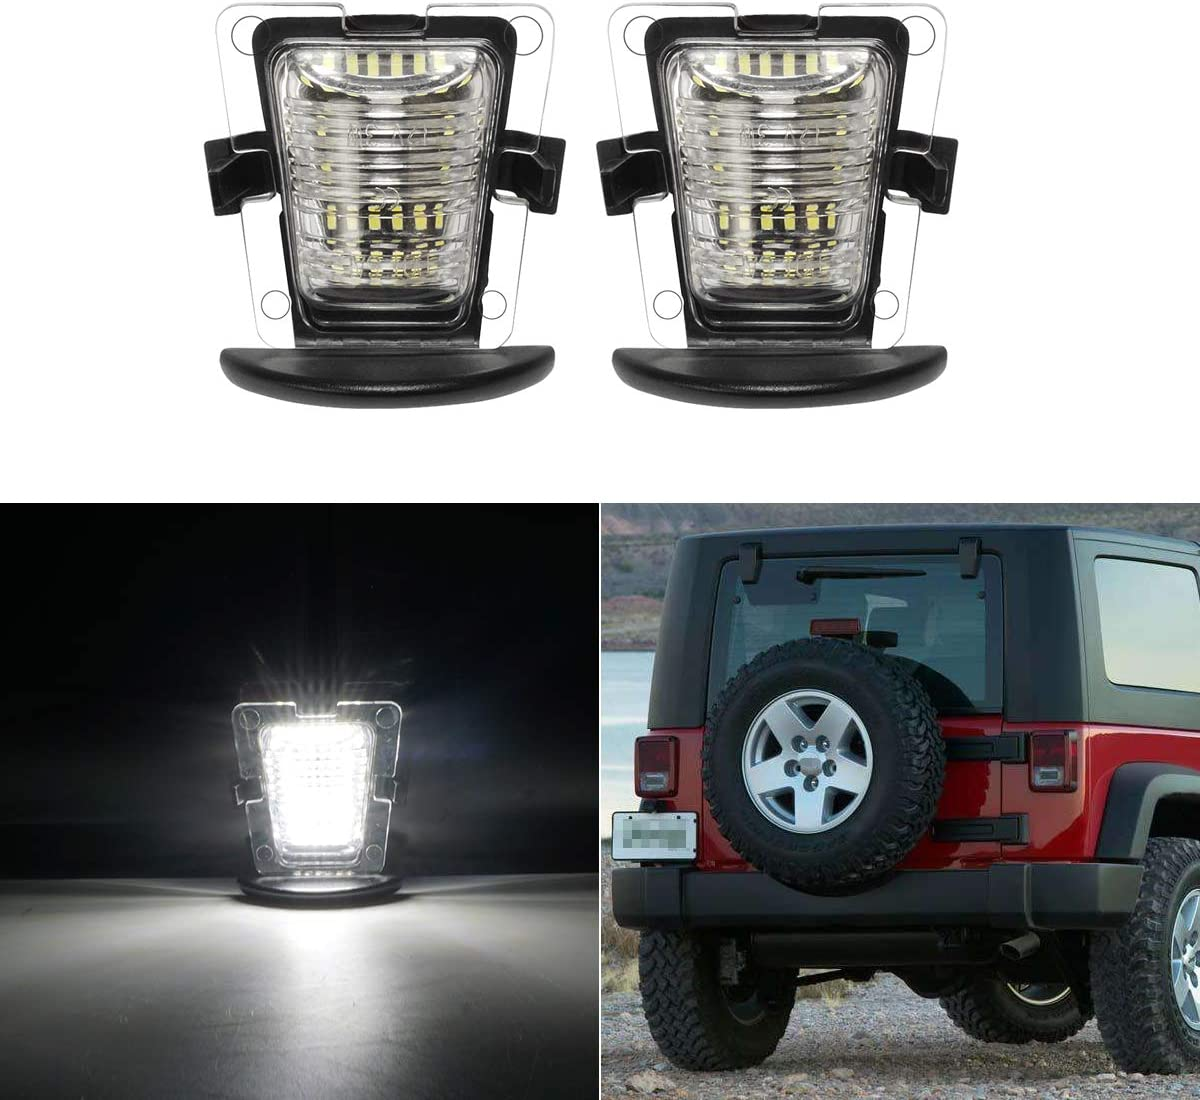 LITTOU 2X LED Kennzeichenbeleuchtung 18 SMD LED CANBUS Error Free Kompatibel f/ür Wrangler JK JKU 2007-2018